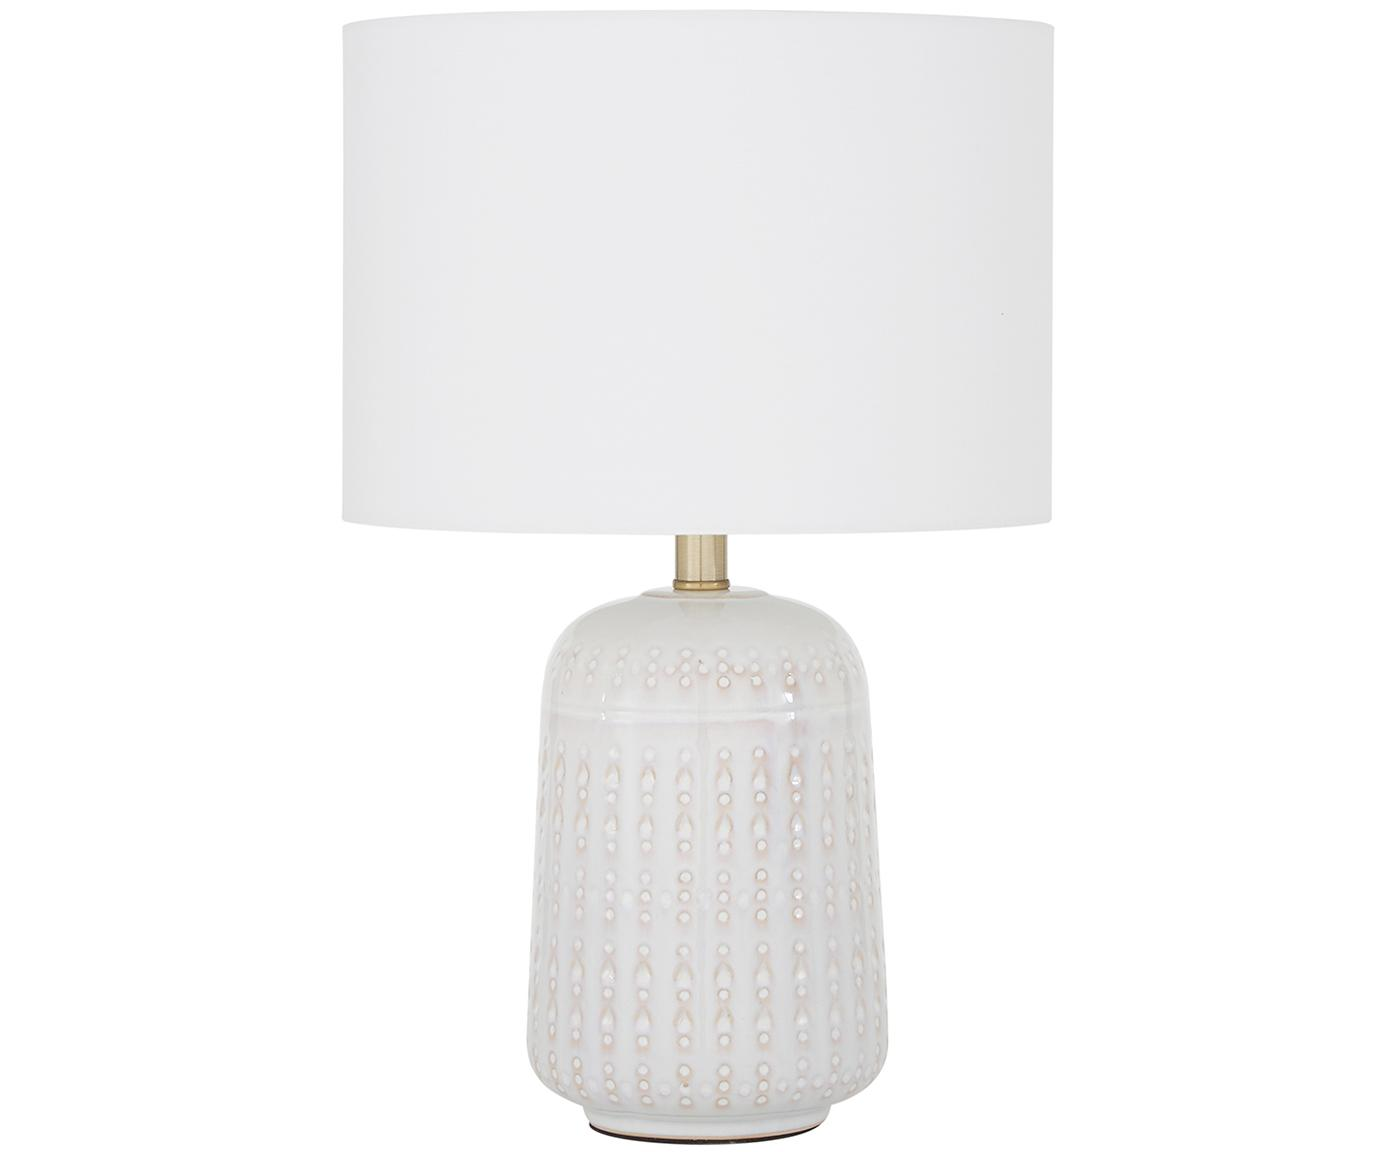 Keramik-Tischleuchte Iva, Lampenschirm: Textil, Lampenschirm: WeissLampenfuss: Cremeweiss, Messing, Ø 33 x H 53 cm